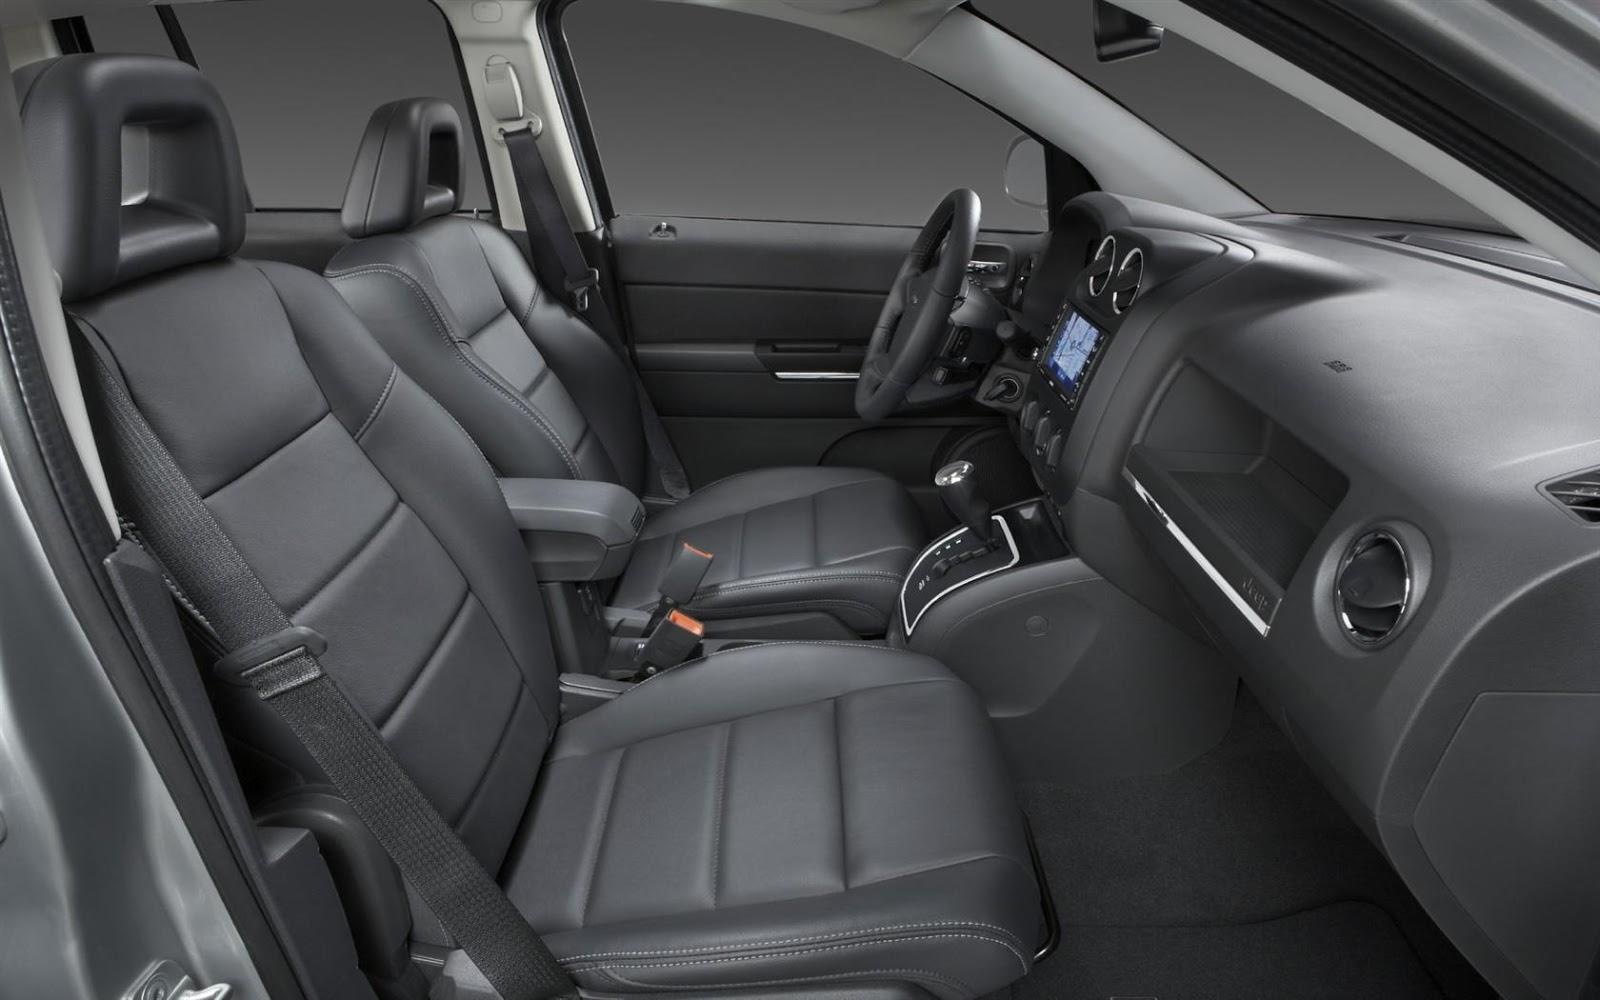 2010 jeep compass manual transmission